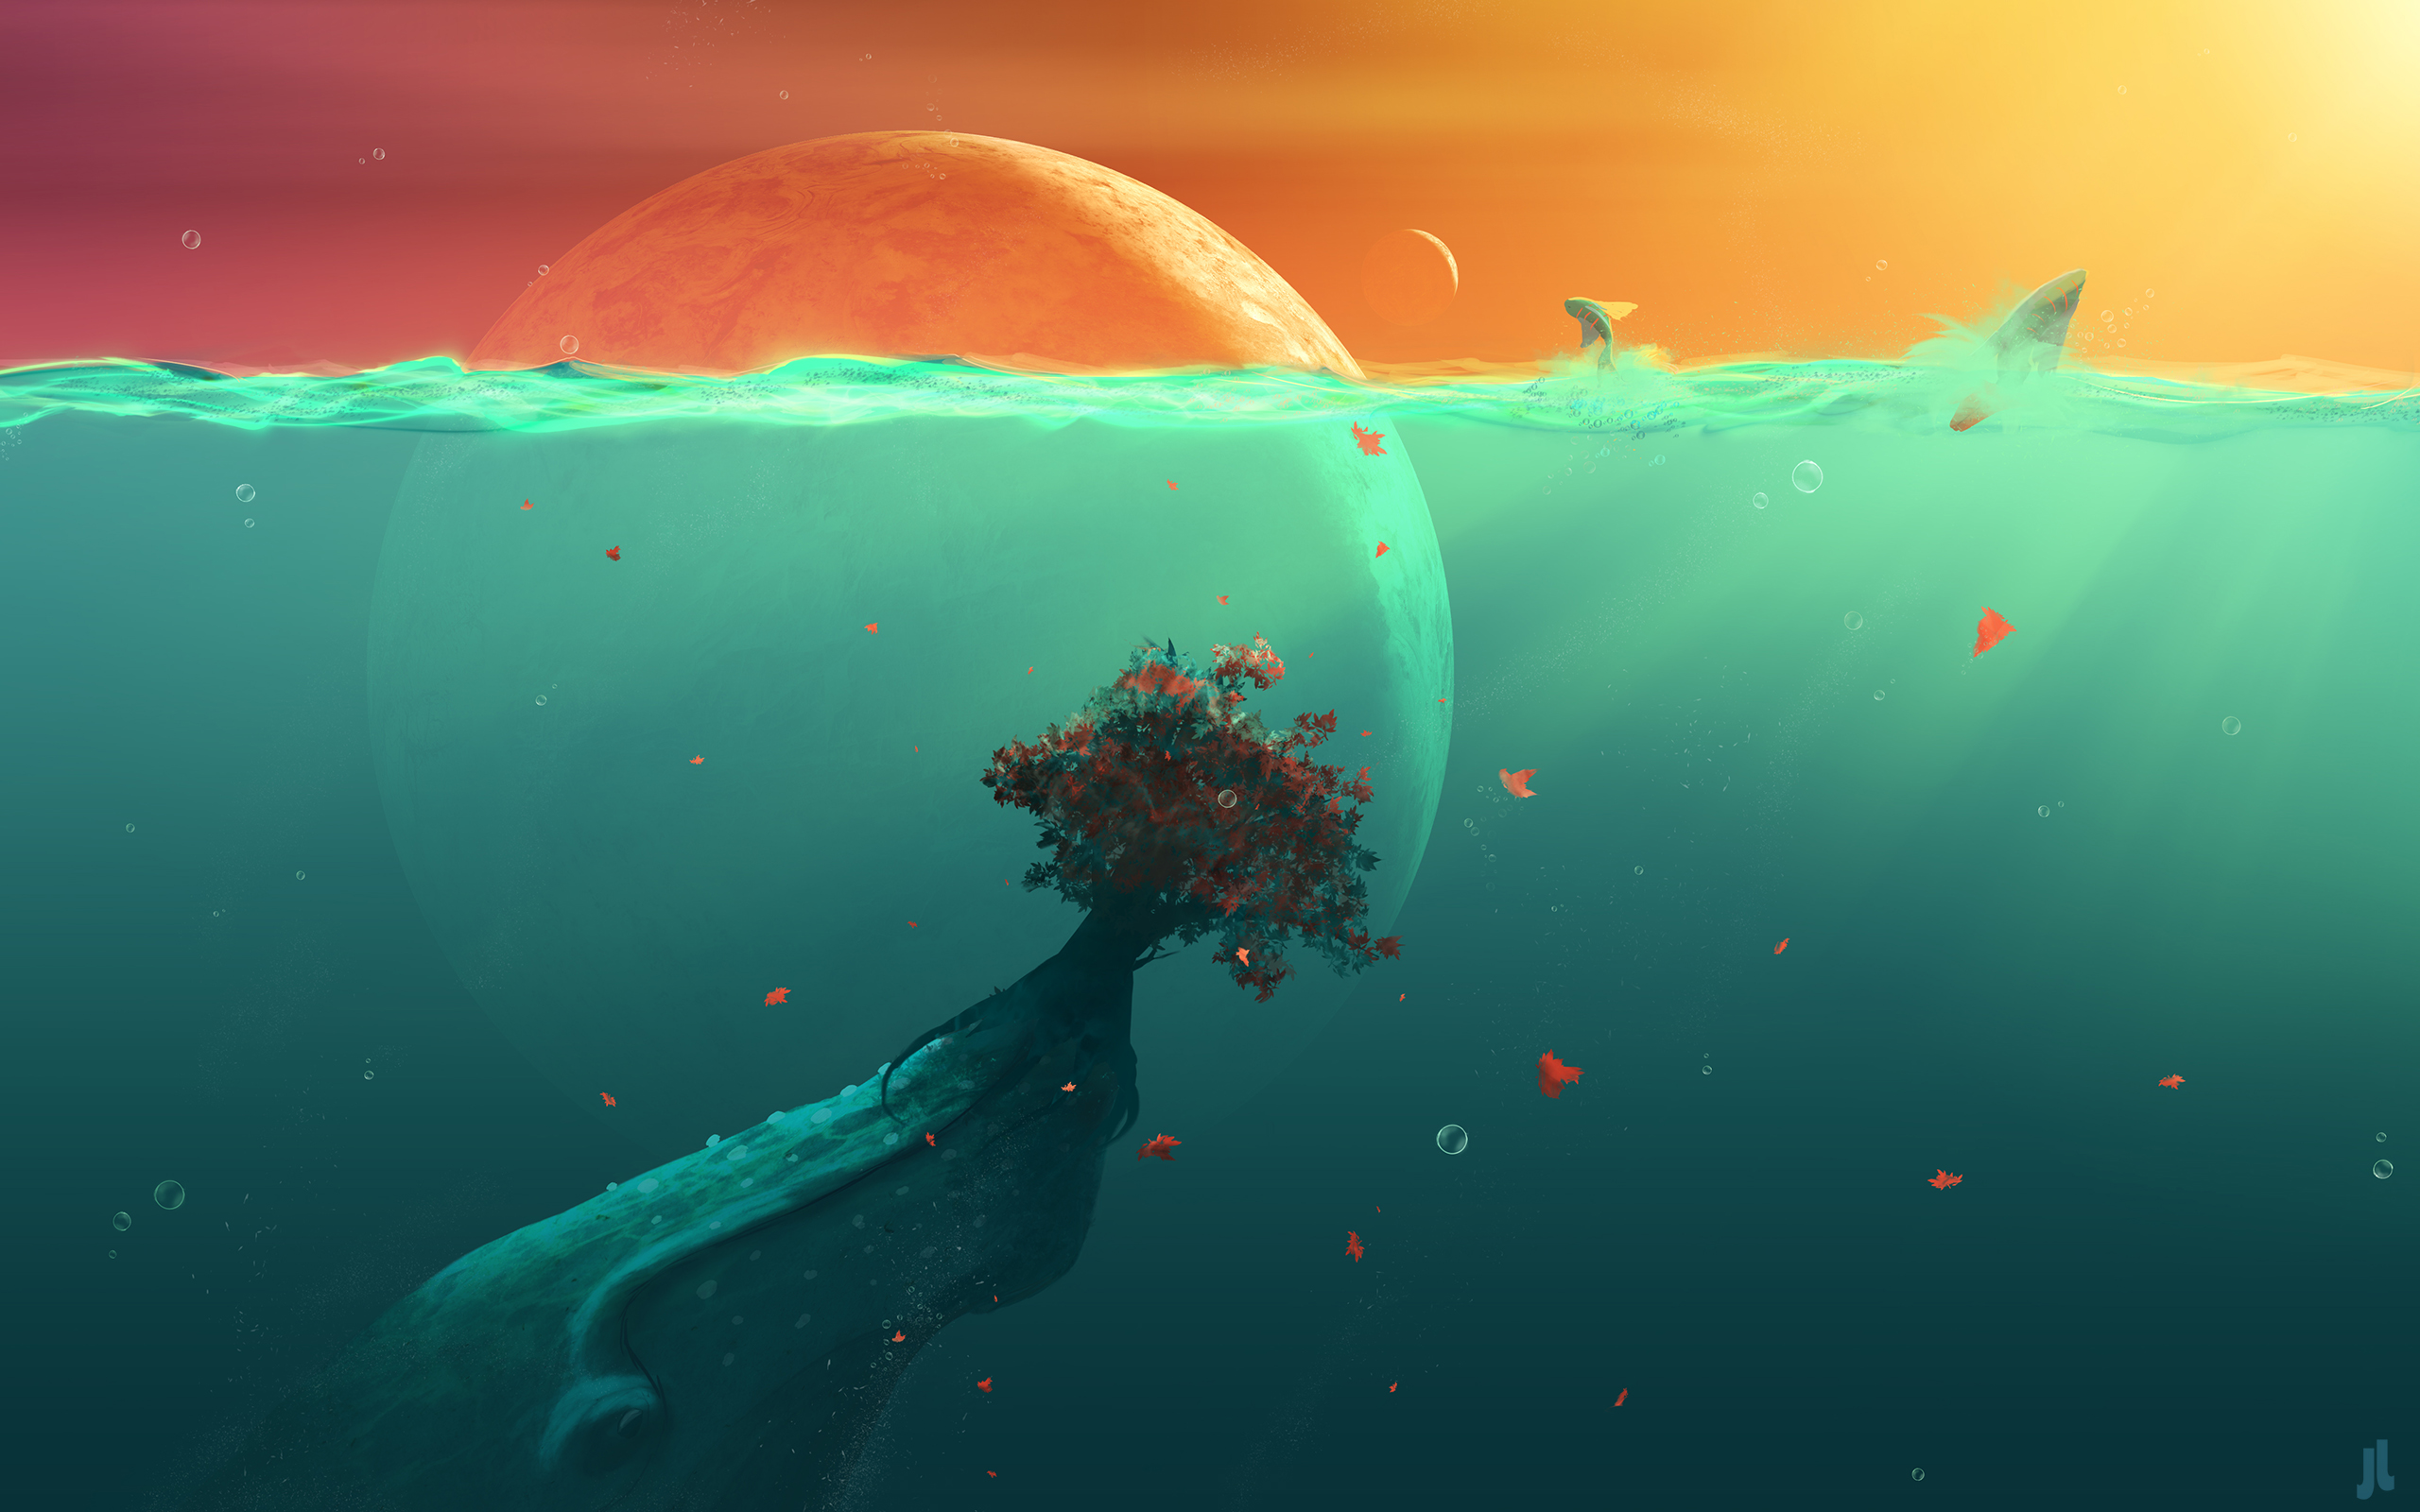 Download 3d Wallpaper Apk Deep Ocean Planet Fish Wallpapers Wallpapers Hd